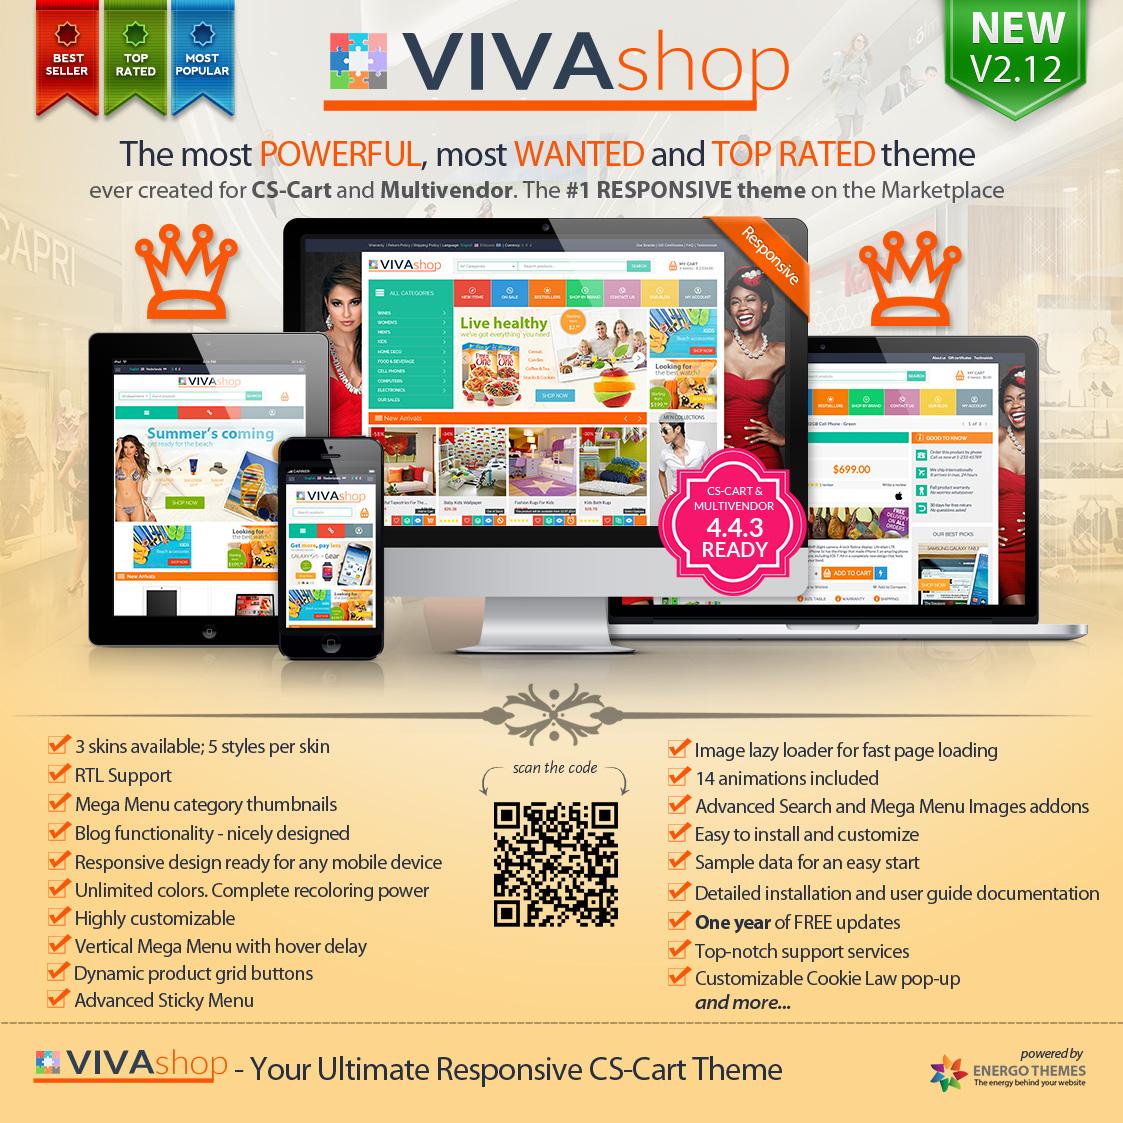 VIVAshop-V2.12-presentation-page-MP.jpg